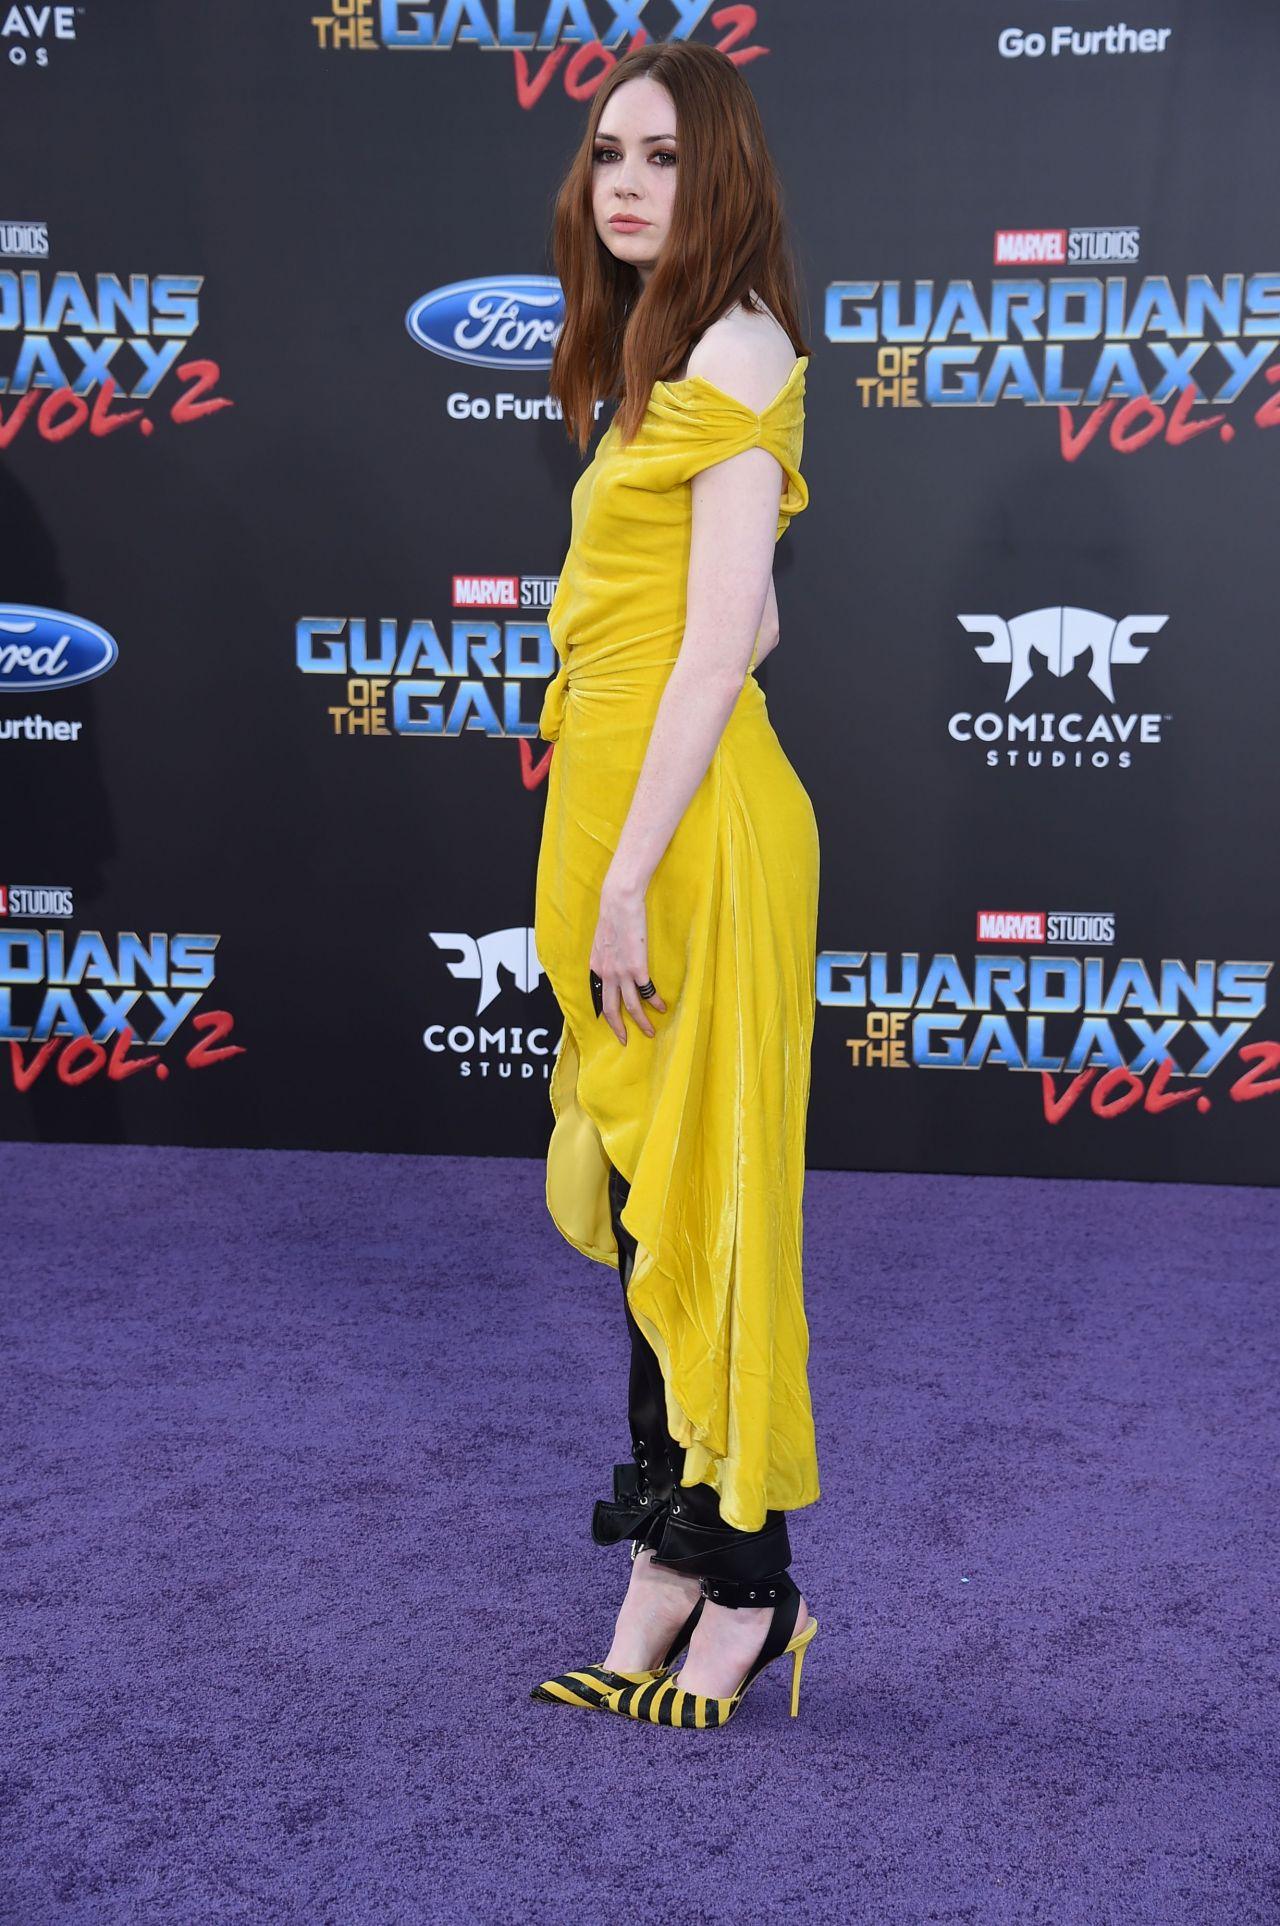 Karen Gillan Guardians Of The Galaxy Vol 2 Premiere In